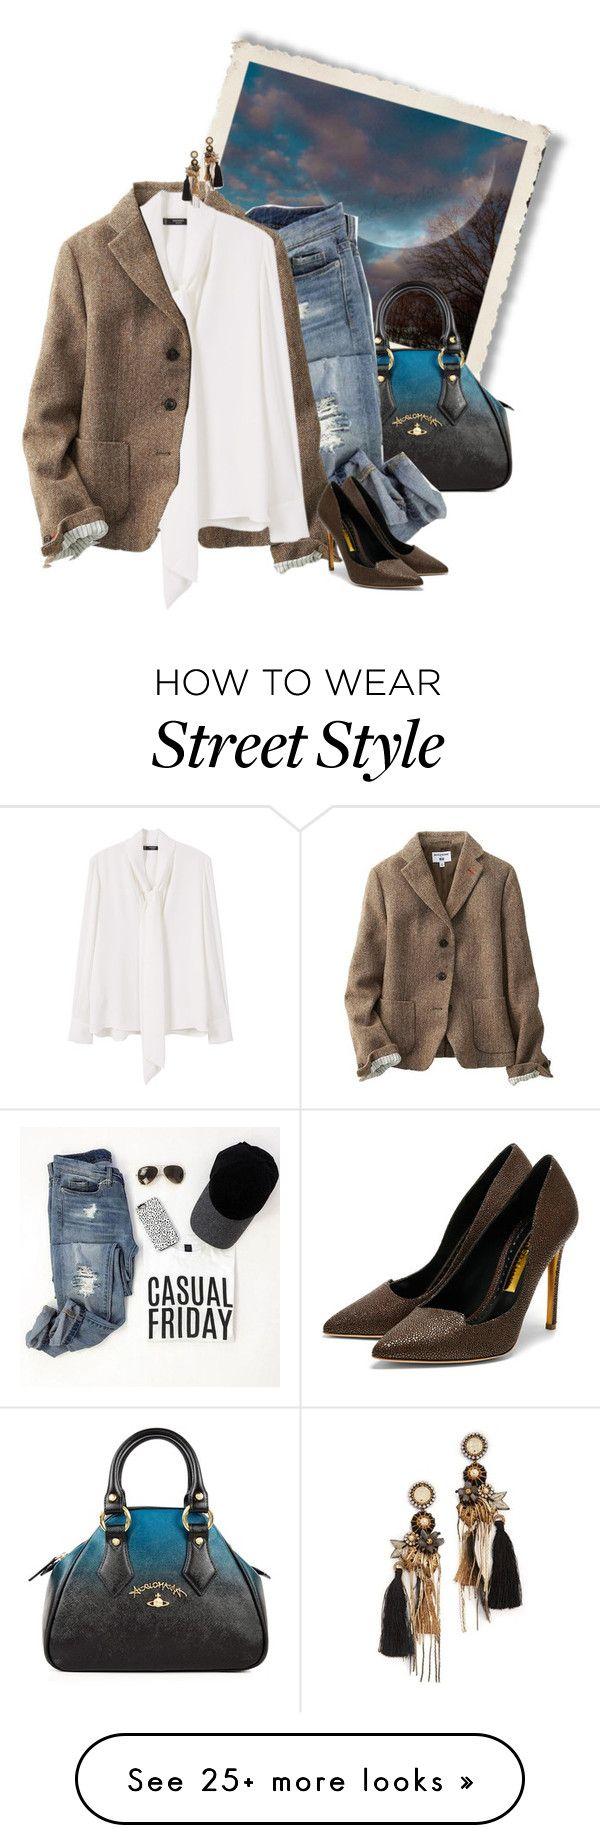 """street style"" by janemichaud-ipod on Polyvore featuring Vivienne Westwood, Uniqlo, MANGO, Rupert Sanderson and Deepa Gurnani"